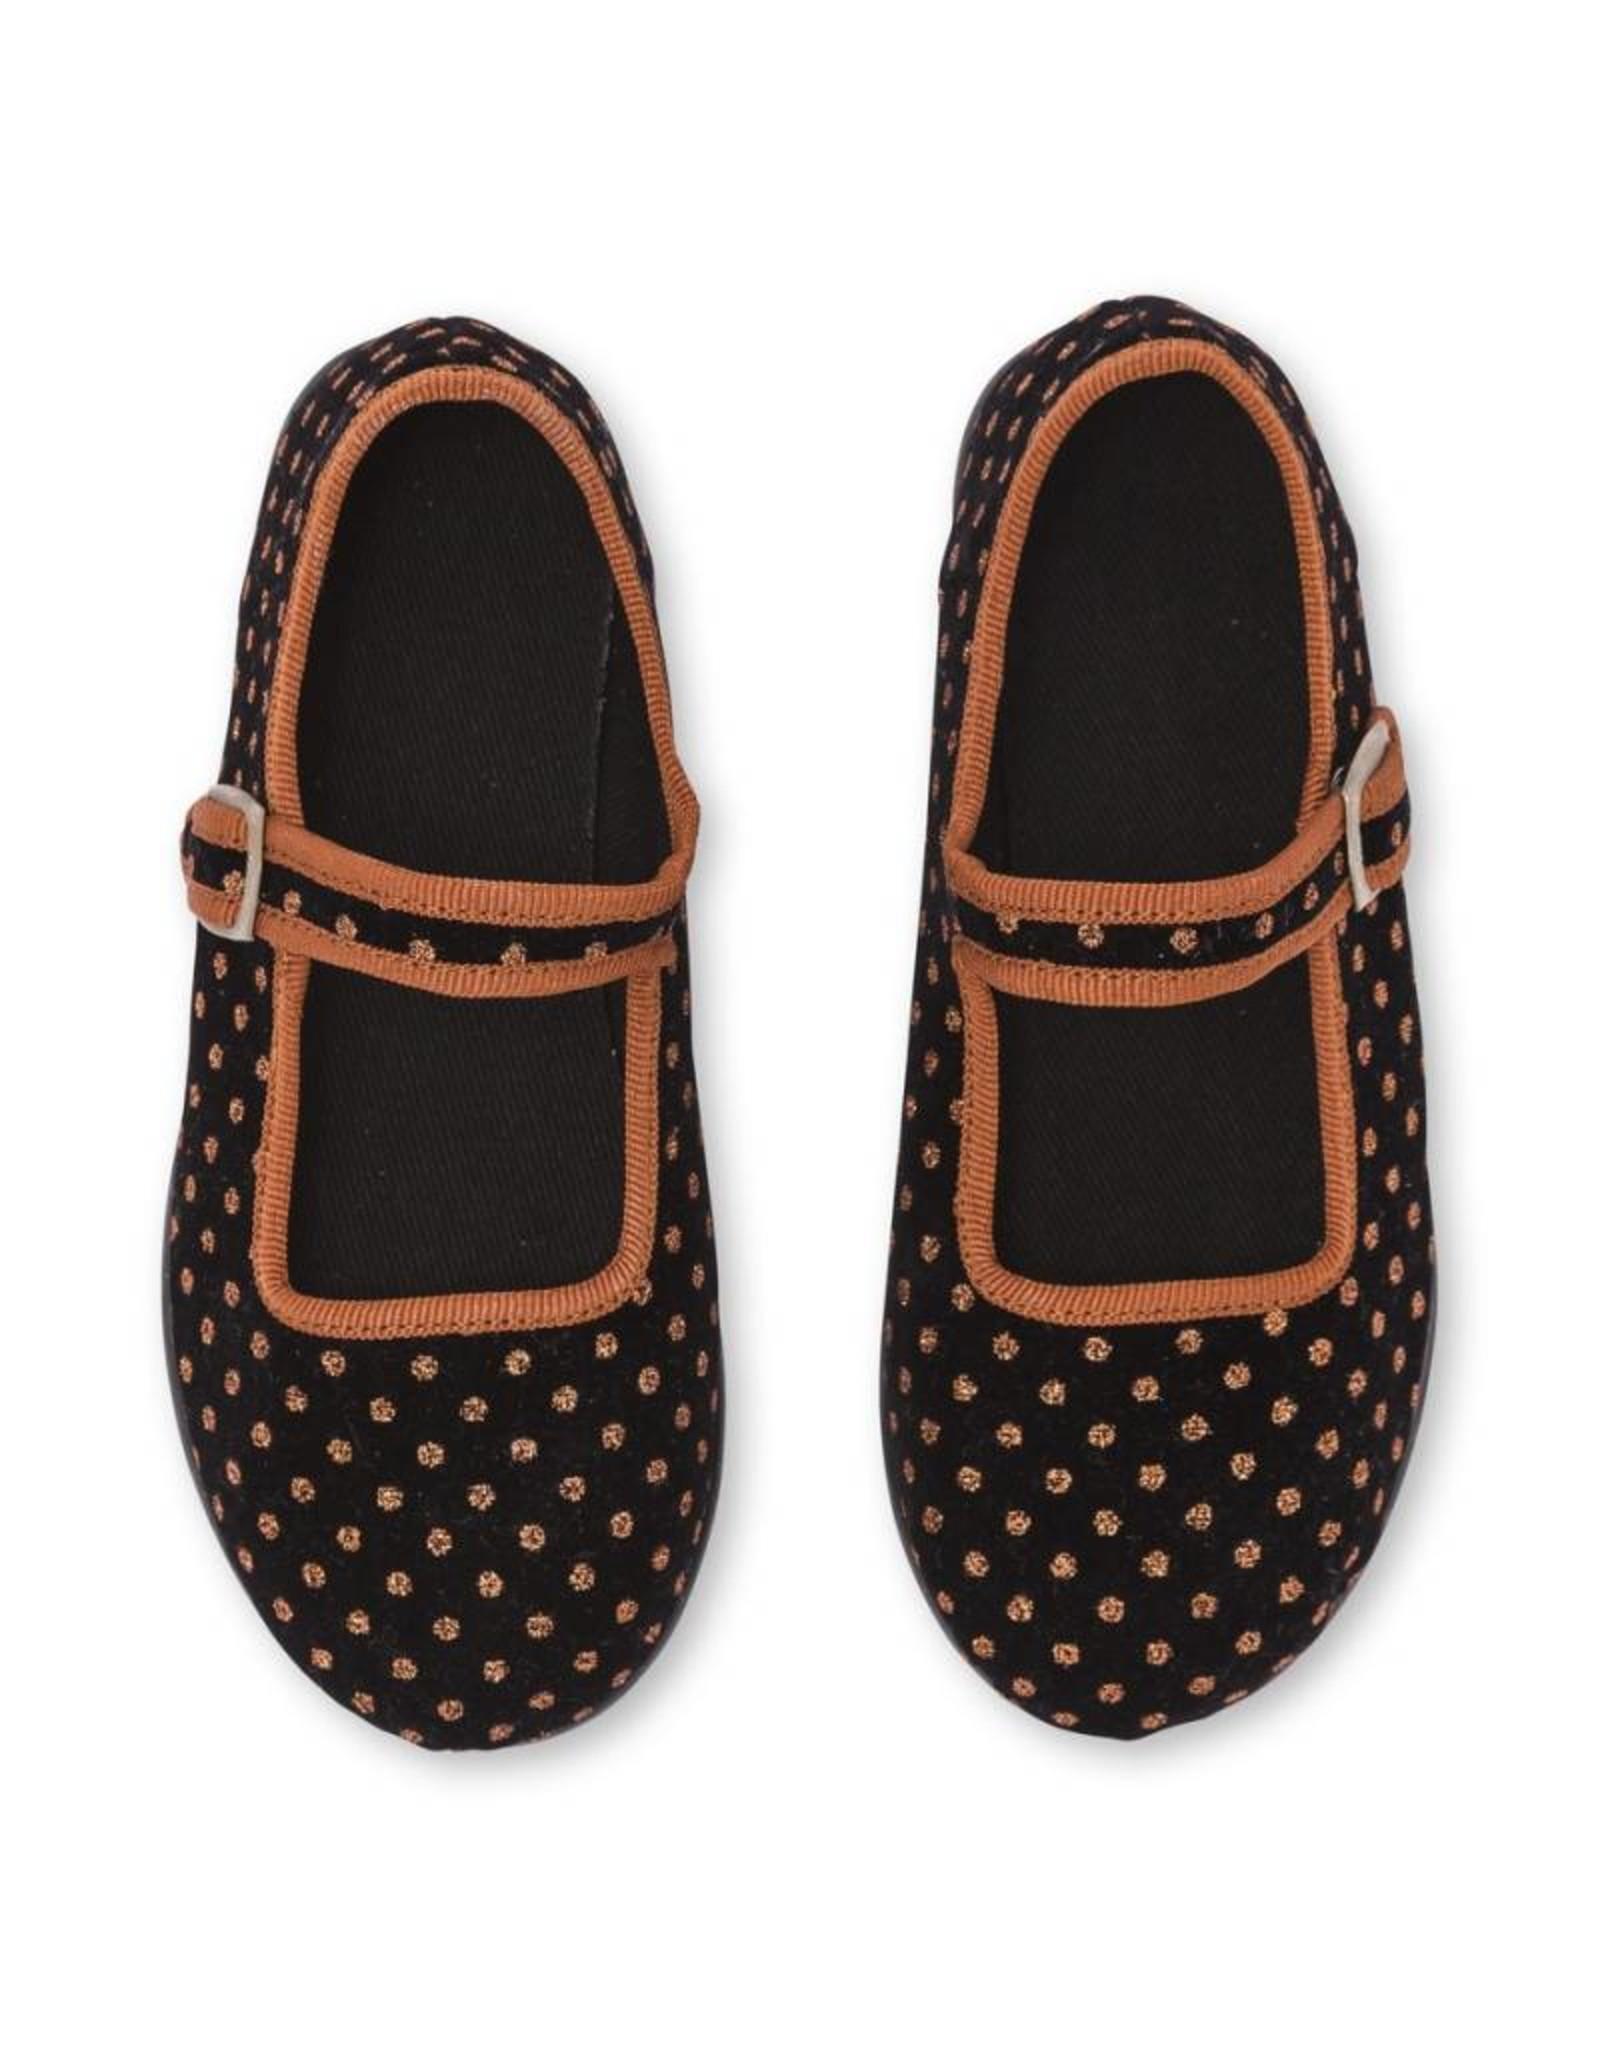 Bonton Baby Jane sling shoes, polka dots print